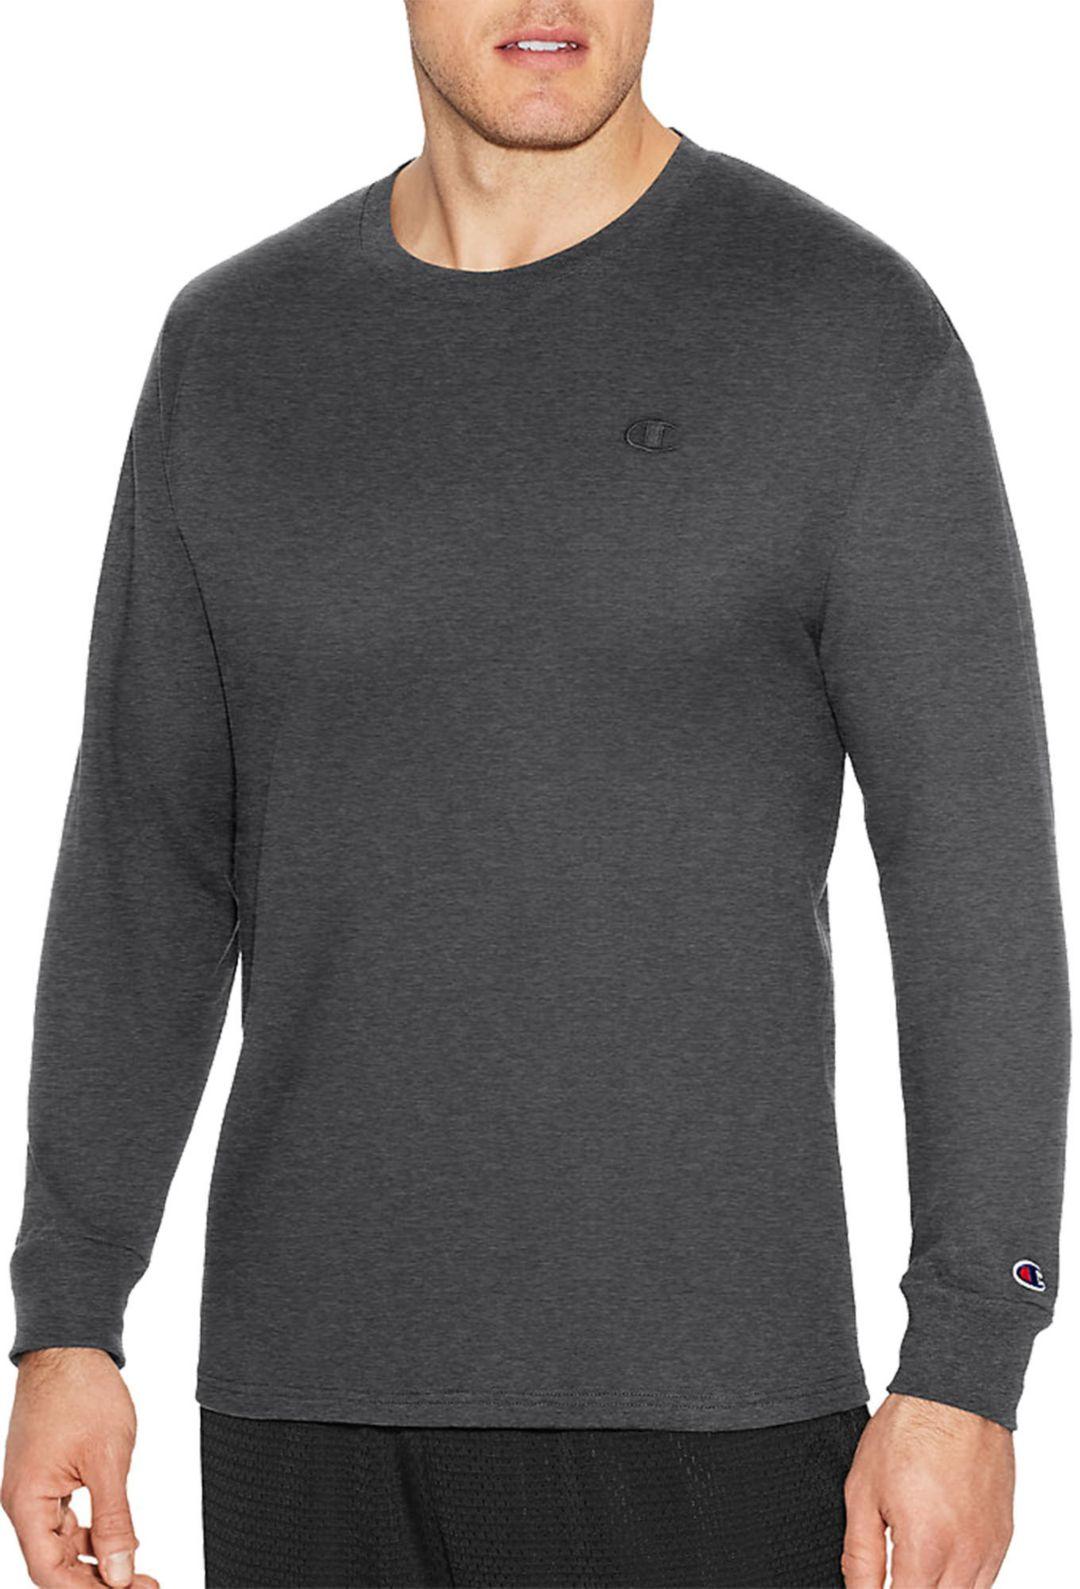 26e91d12b6ffe0 Champion Men's Classic Cotton Long Sleeve Shirt | DICK'S Sporting Goods